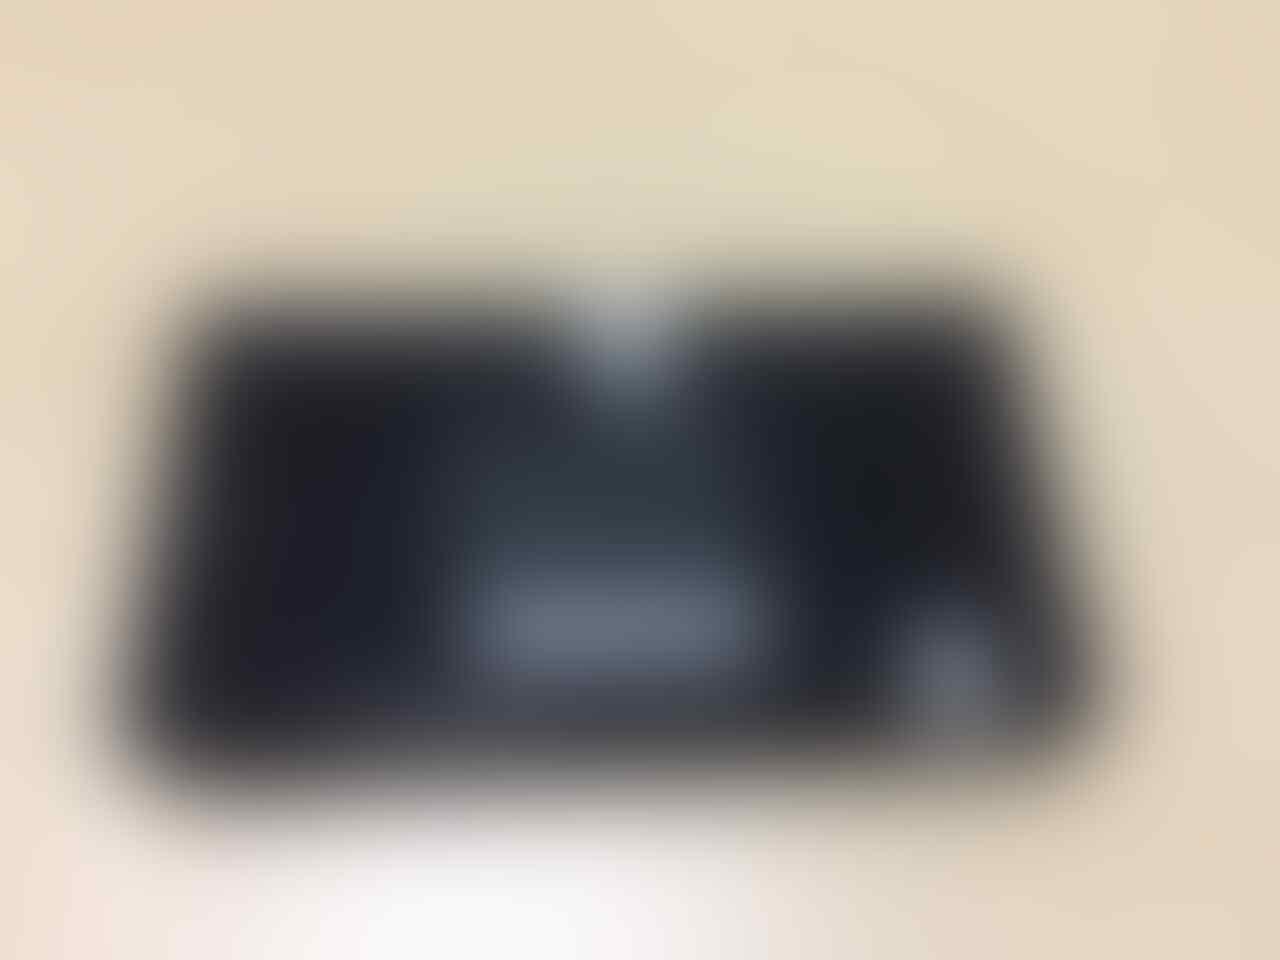 Terjual Nintendo Ds Lite Black Free Edge Card Memori 8gb 2nd Hand